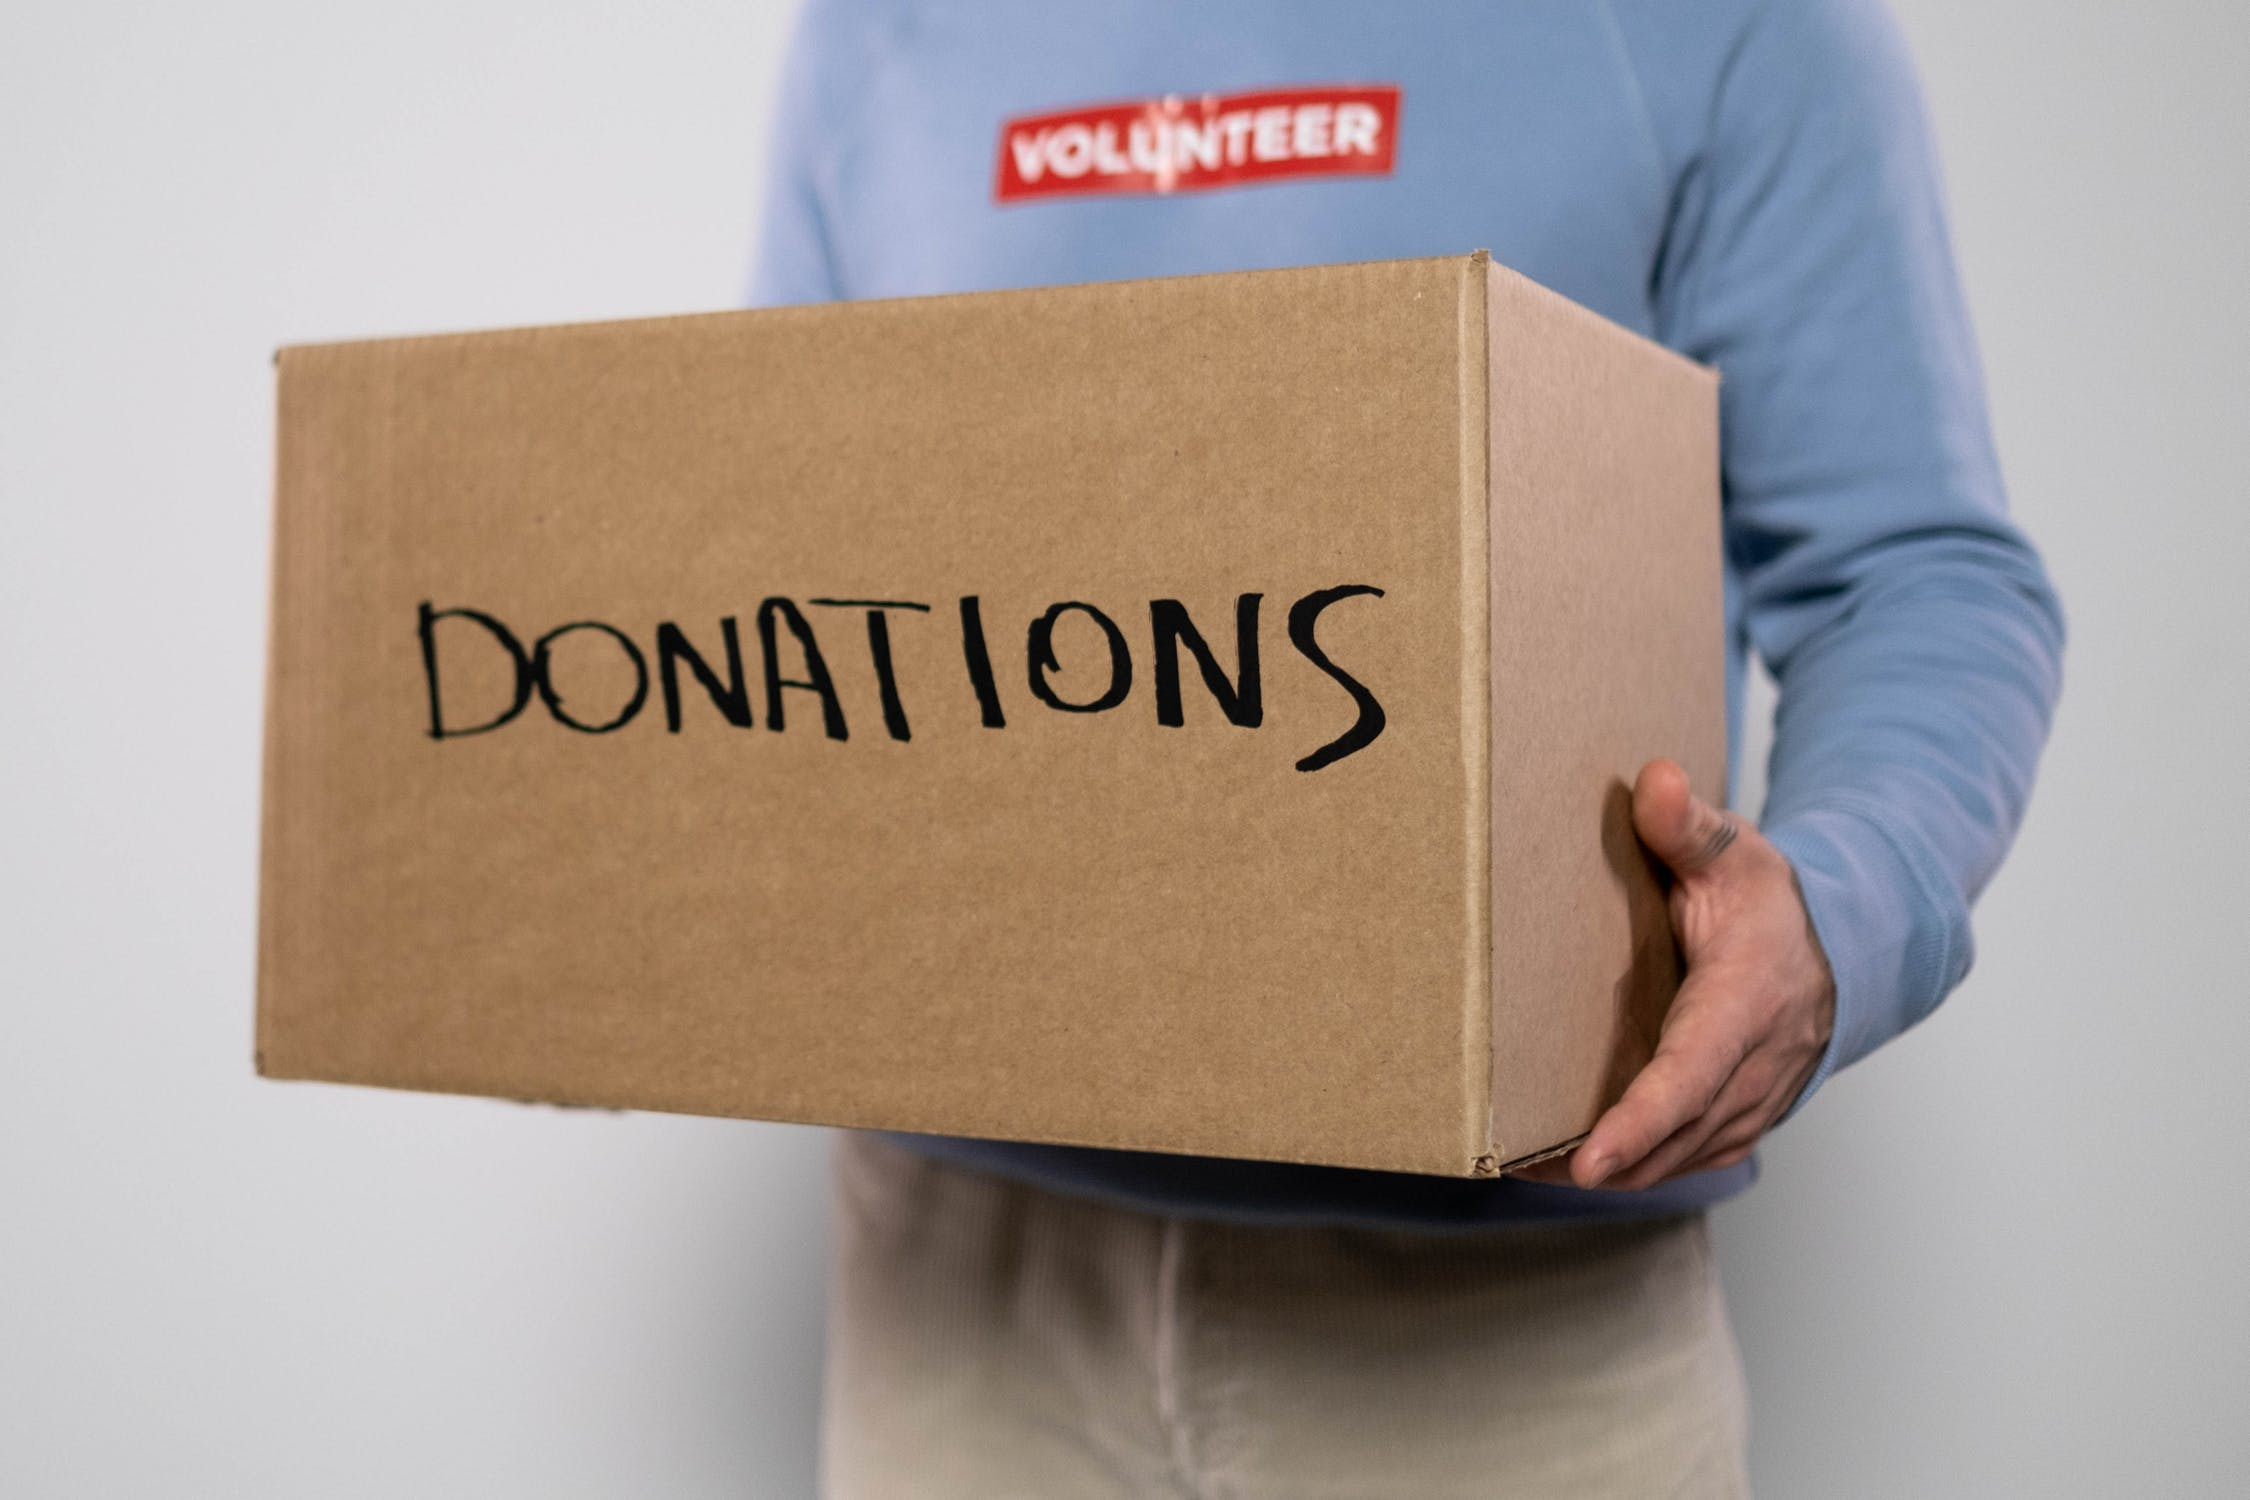 Saugeen First Nation Donations